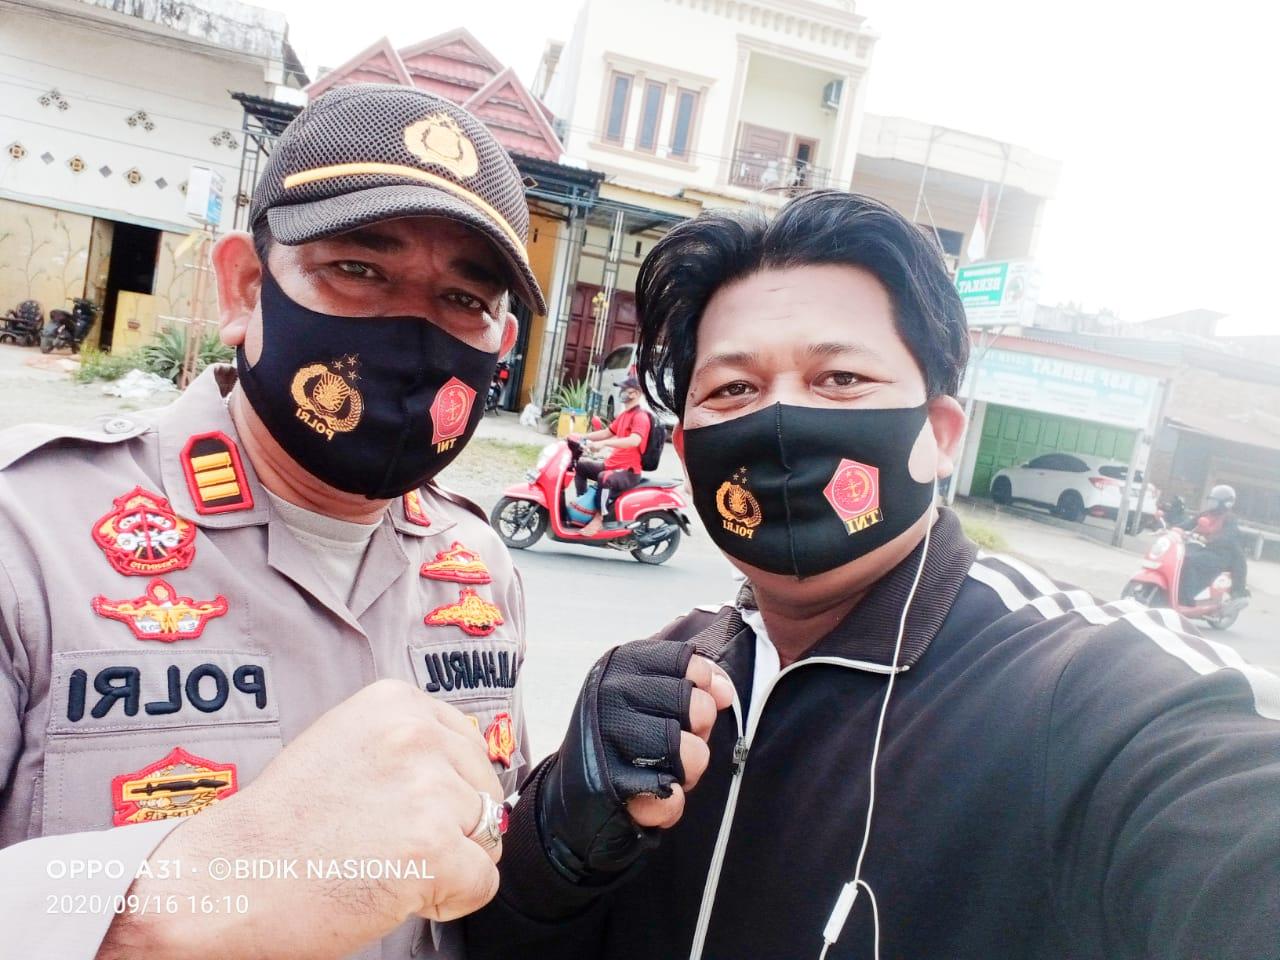 Kapolsek Dua Pitue Apresiasi dan Support Giat Bagi Masker Othems Auto Club